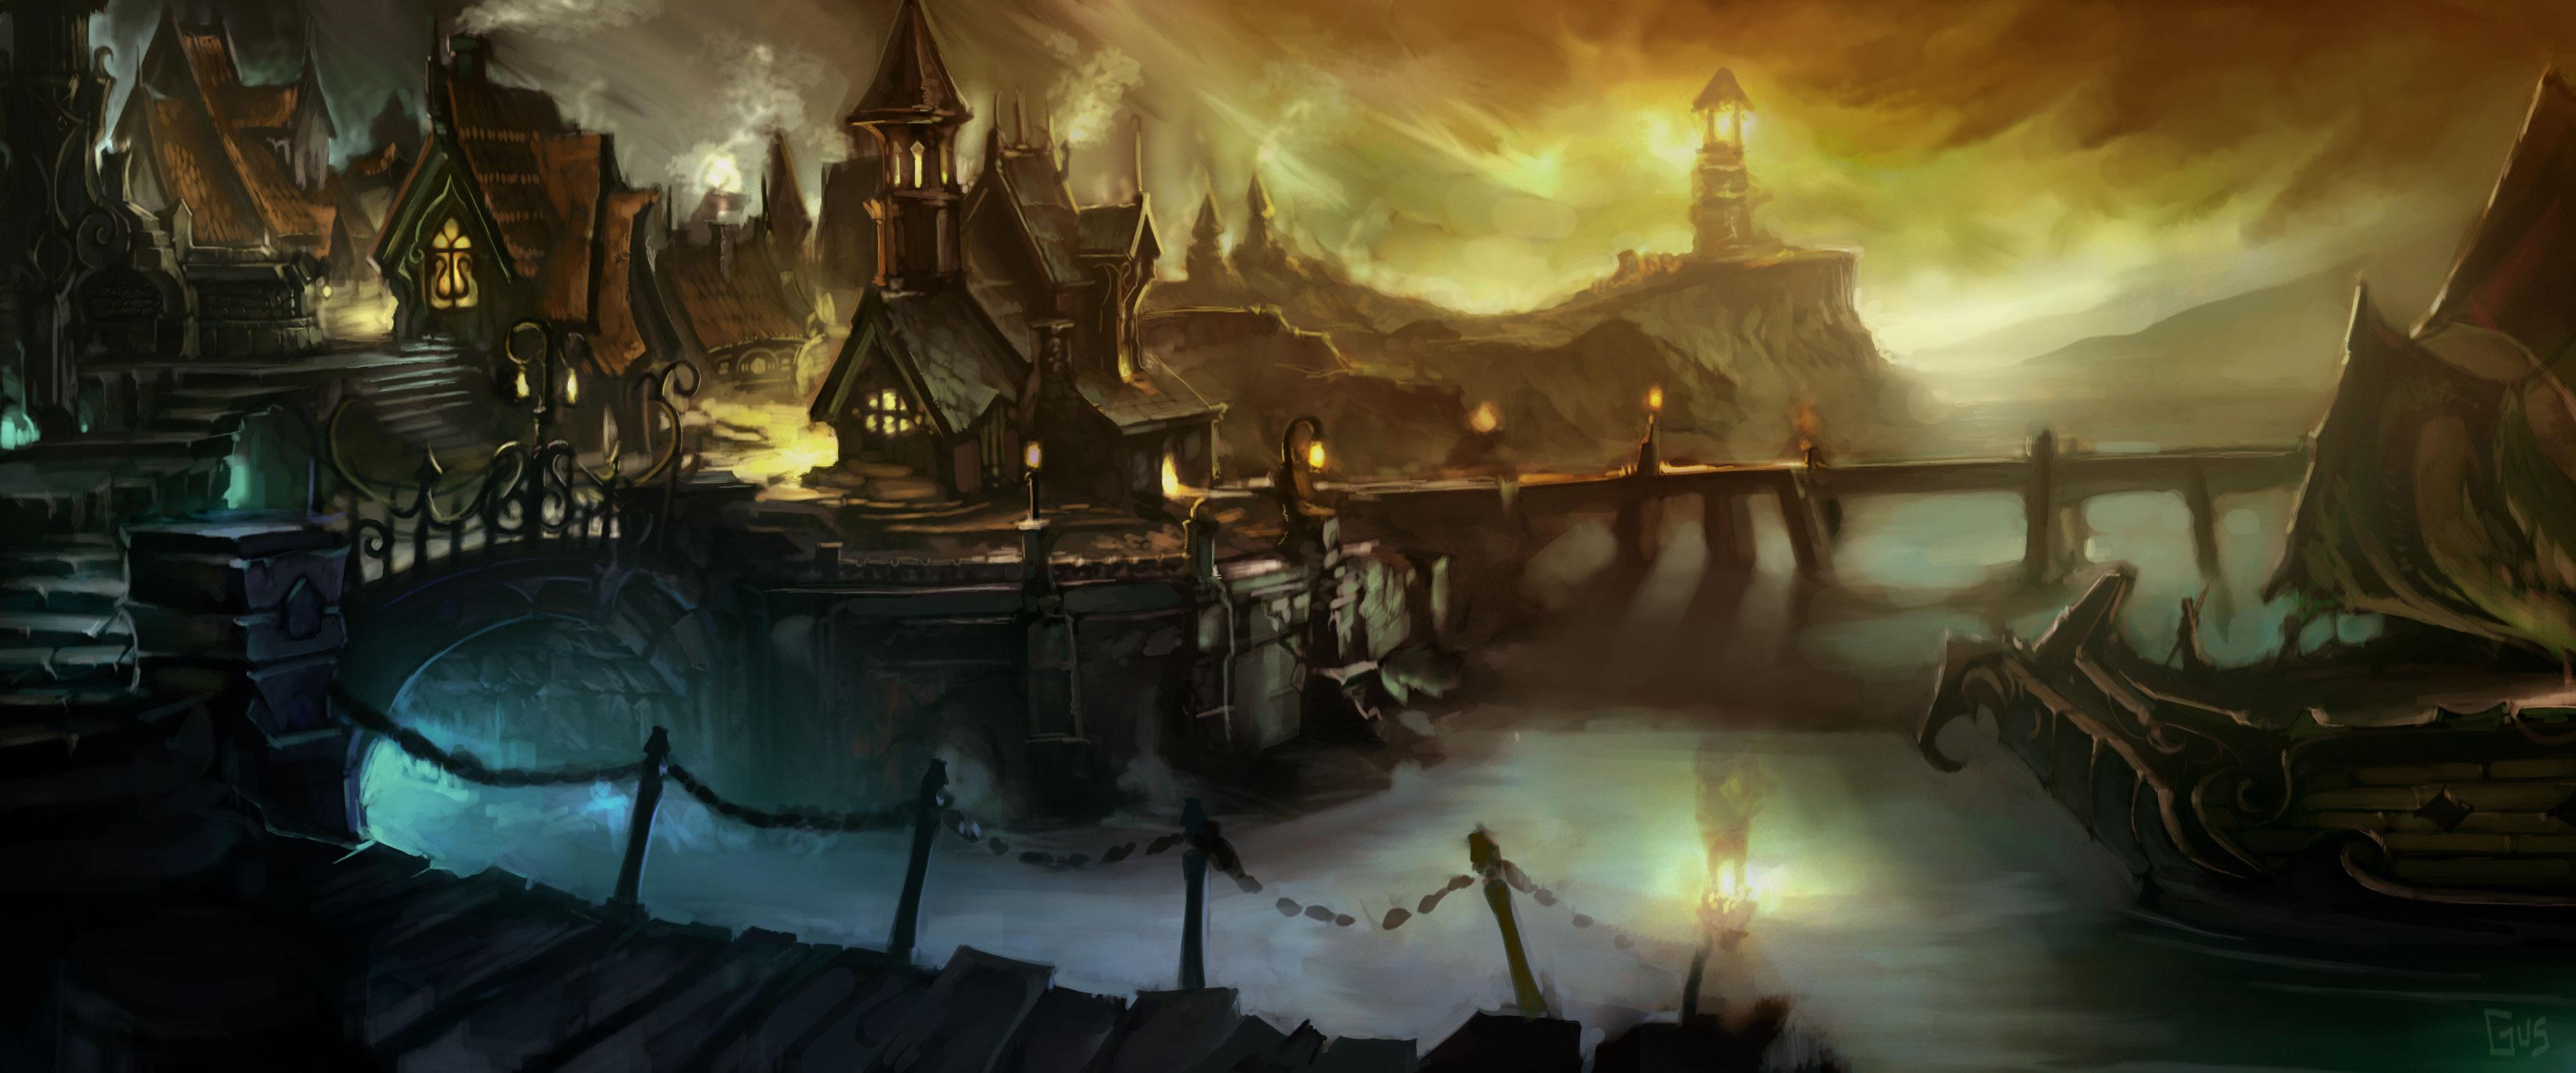 Wallpaper : World of Warcraft, Blood Elf, energy, girl, eyes ... | 1458x3500